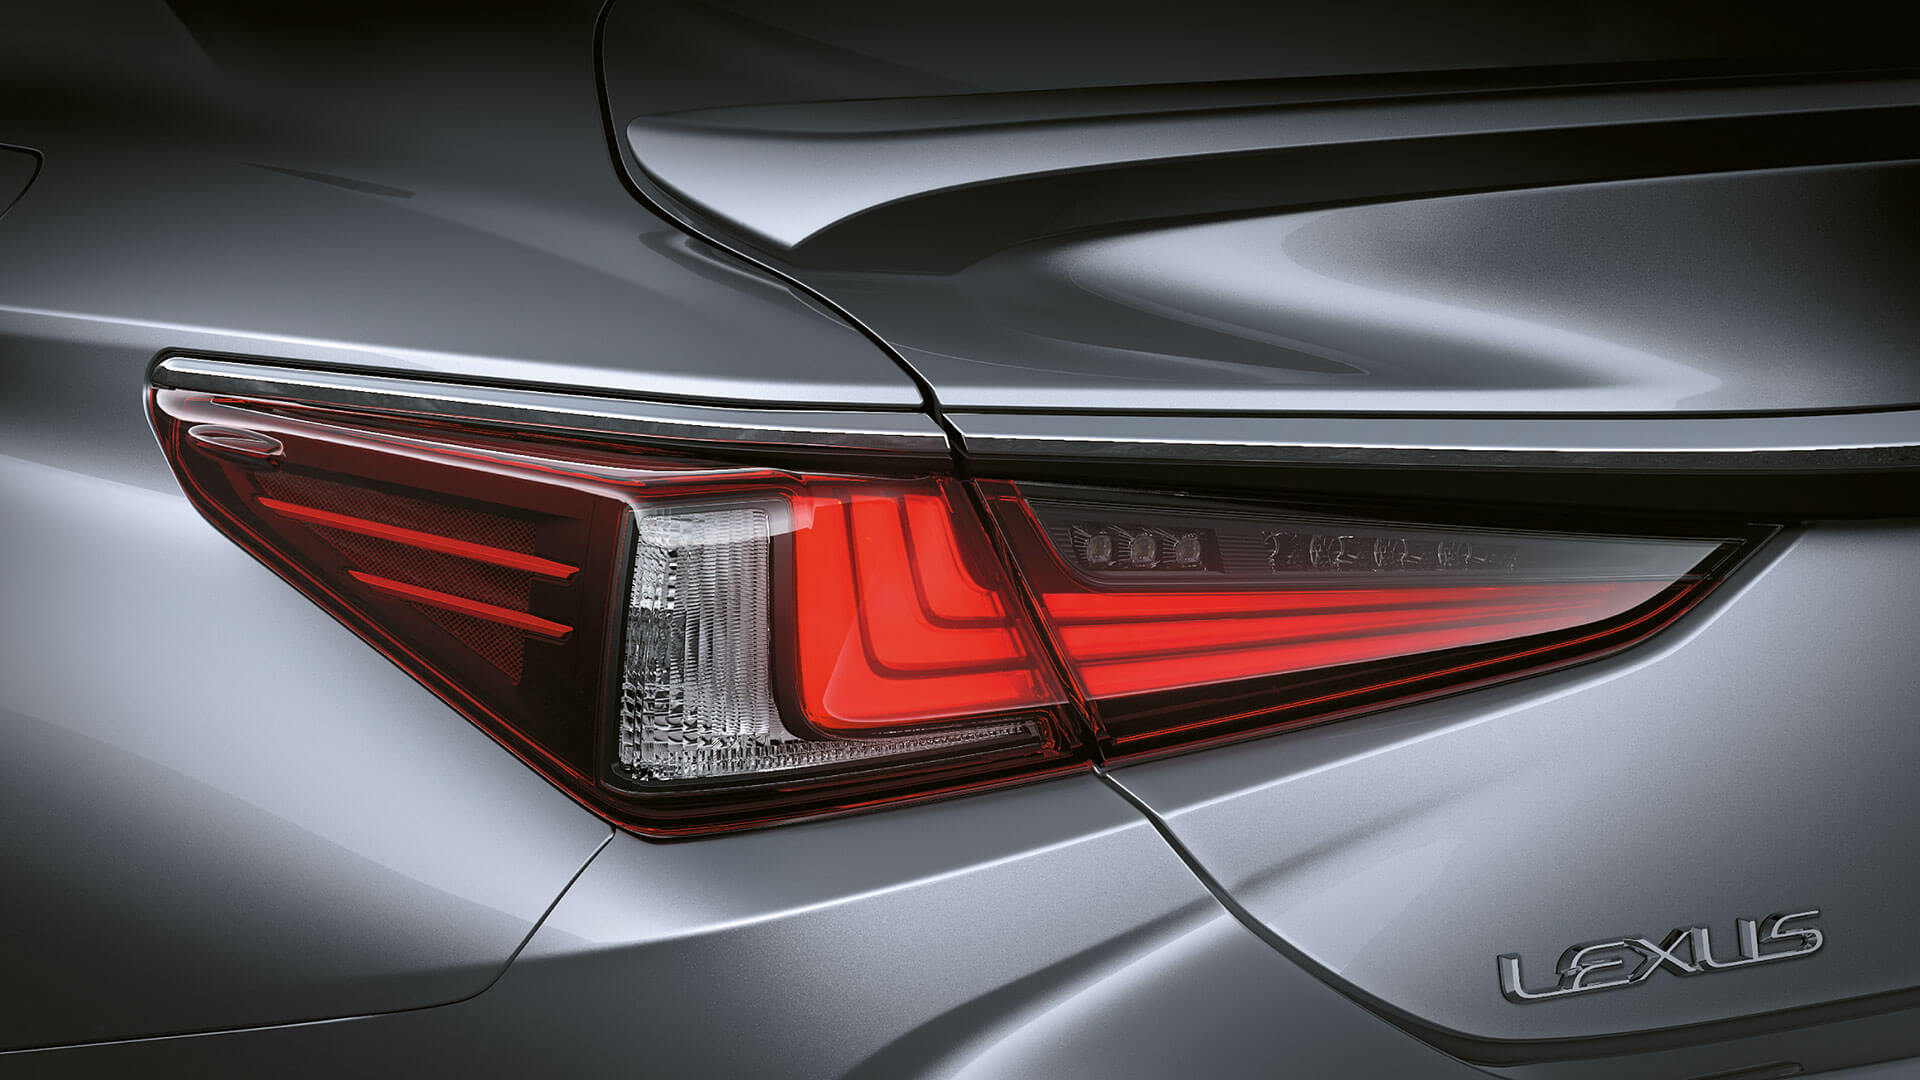 2019 lexus es hybrid experience feature rear led lights